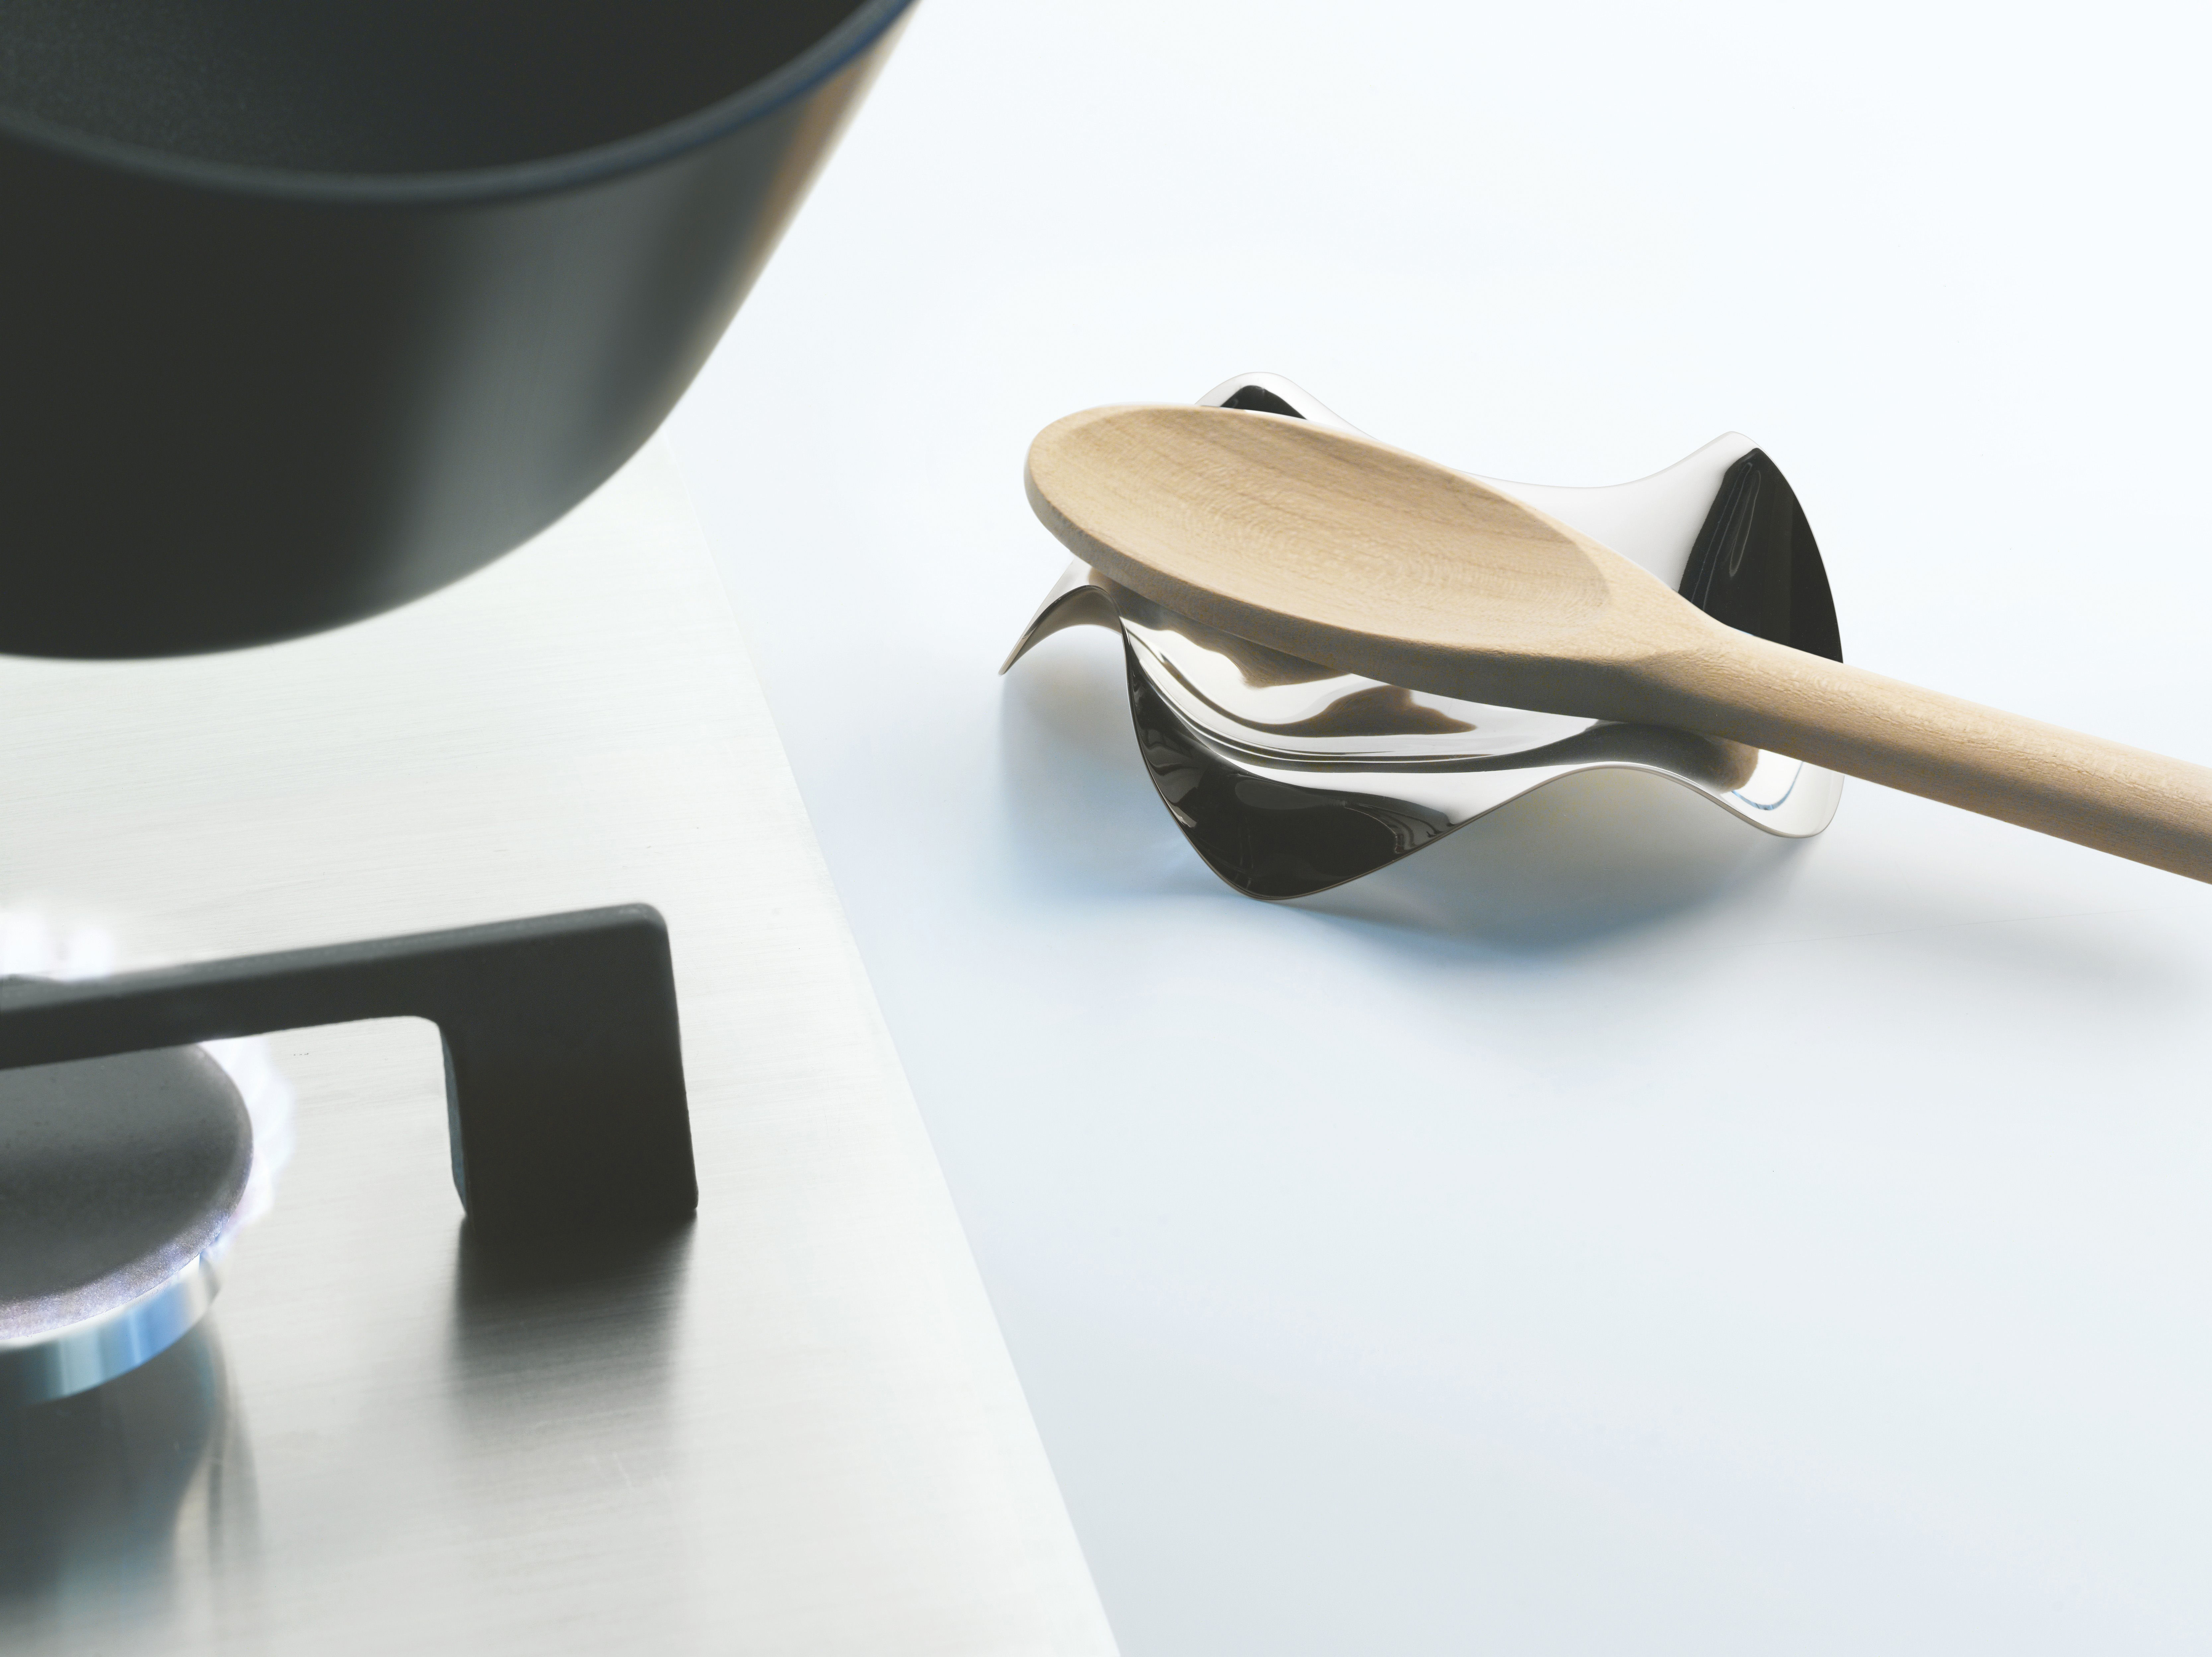 repose cuill re blip acier brillant alessi. Black Bedroom Furniture Sets. Home Design Ideas